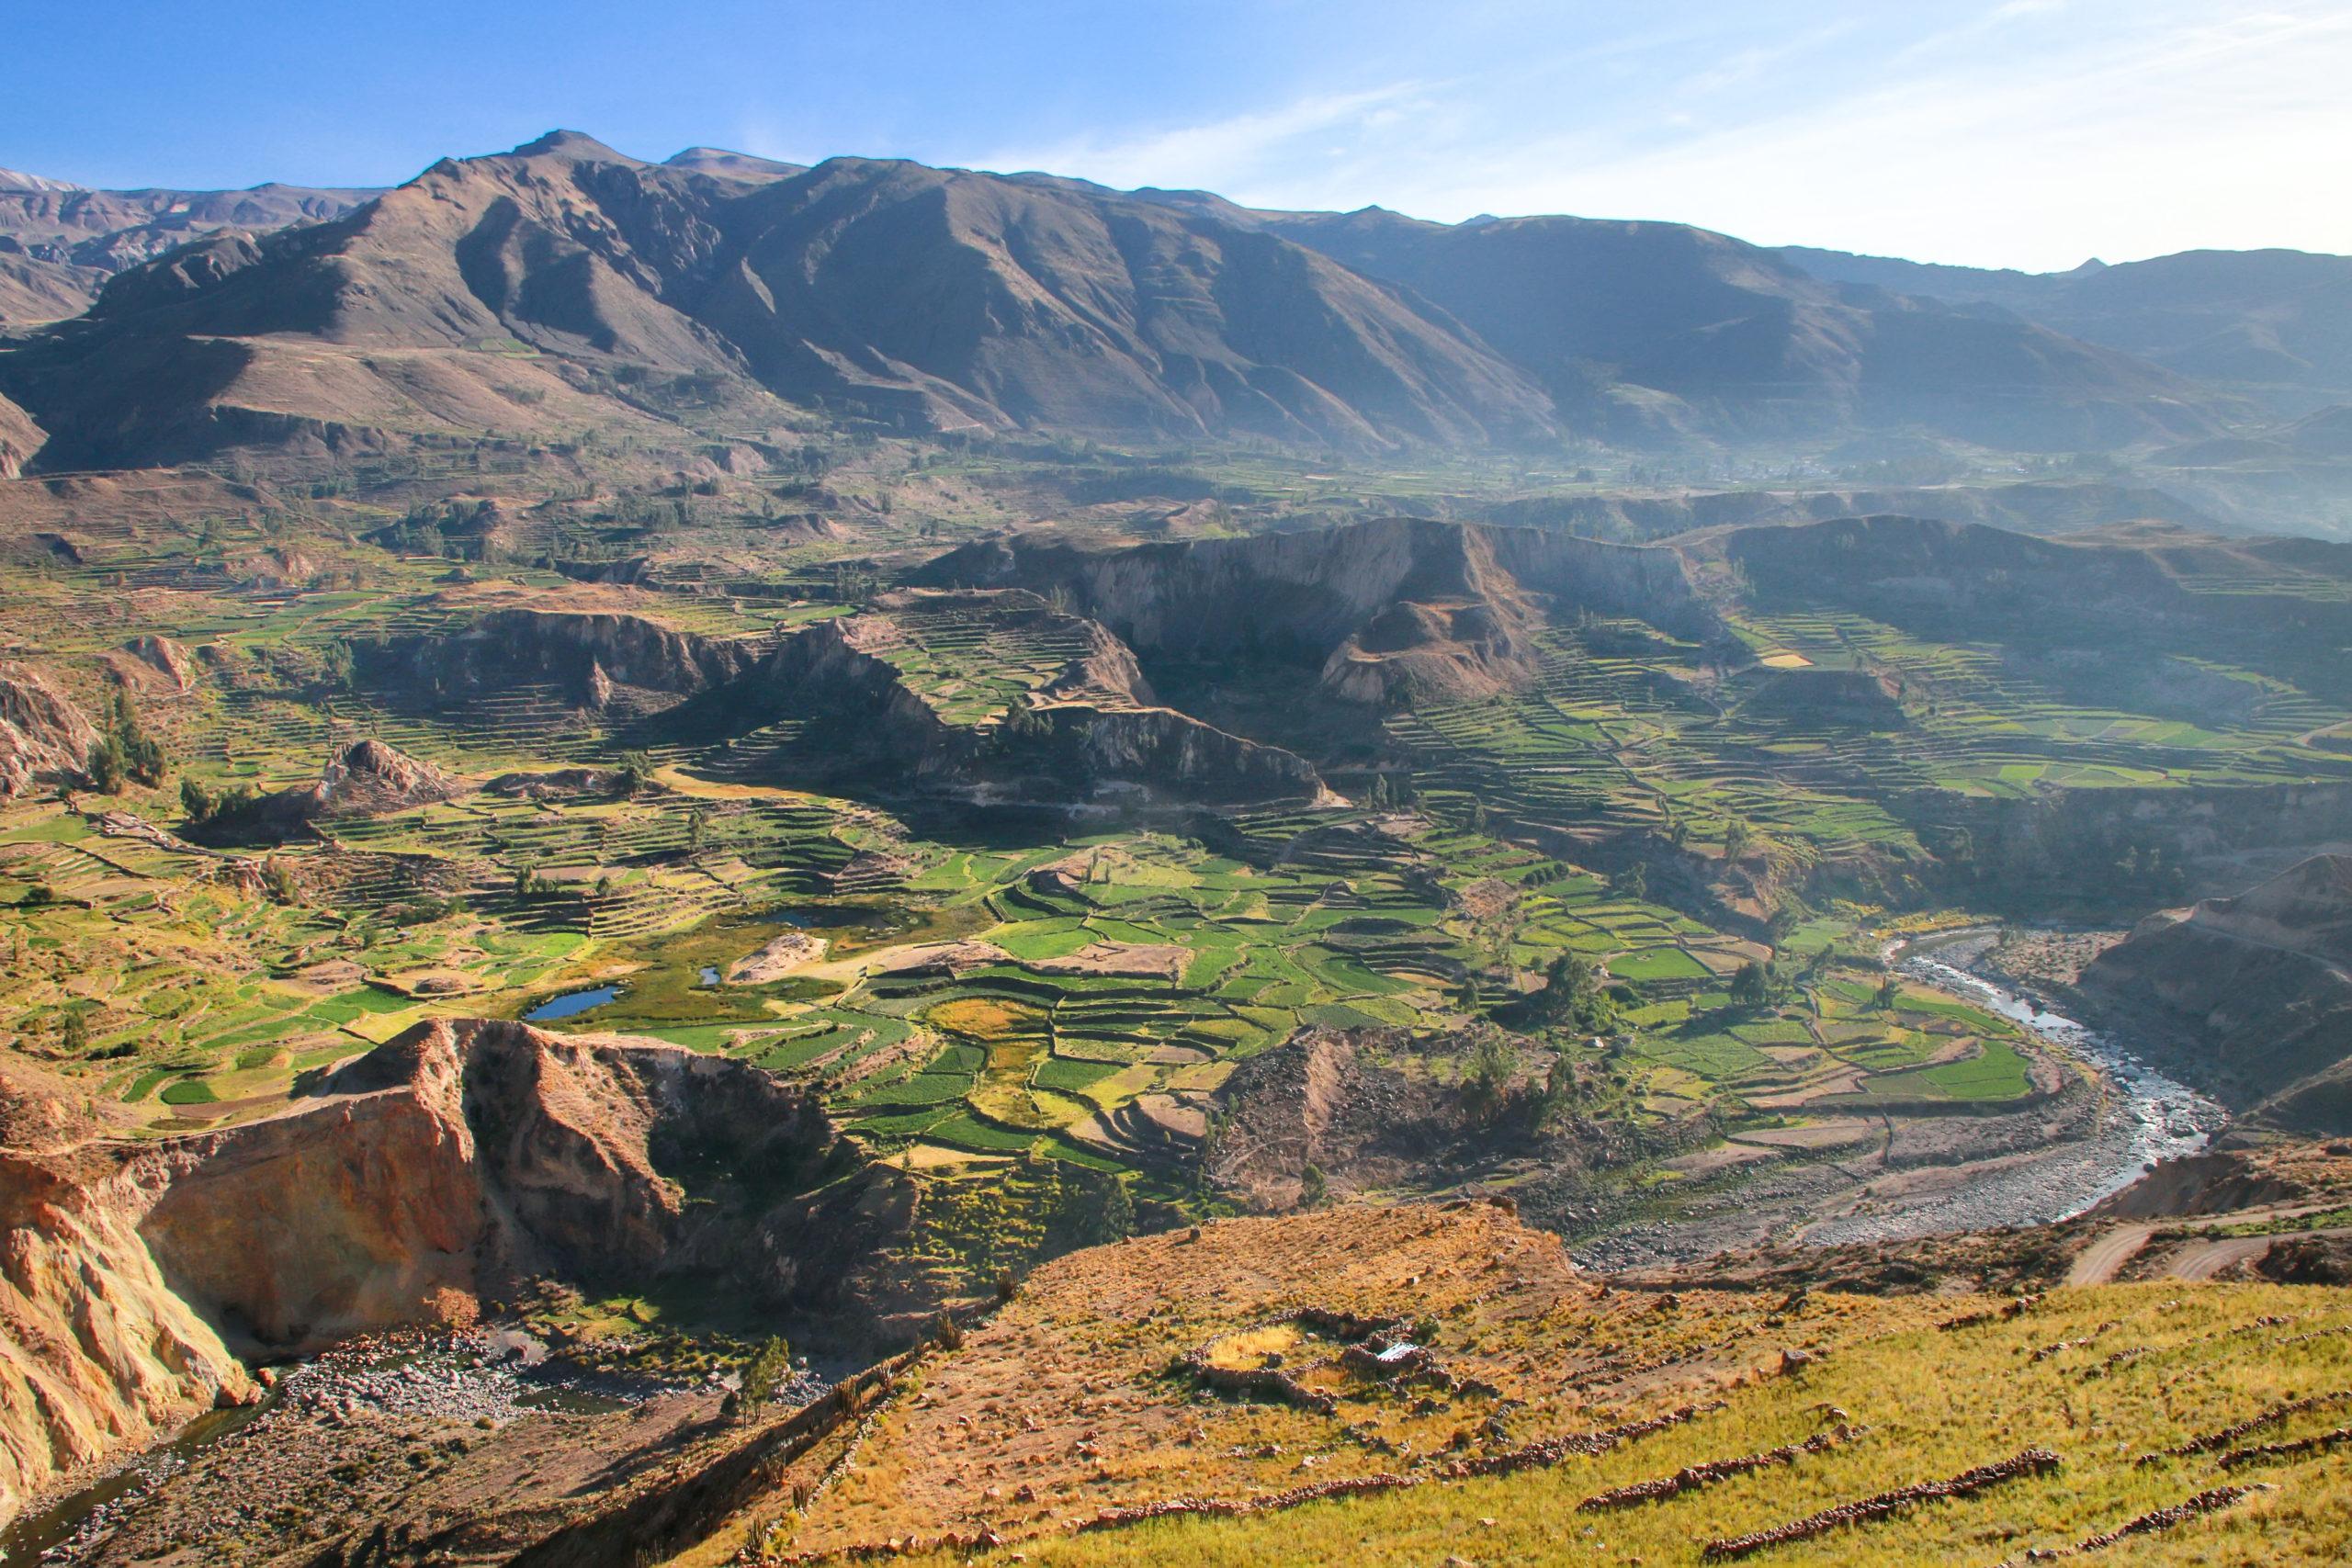 La vallée du Canyon de Colca